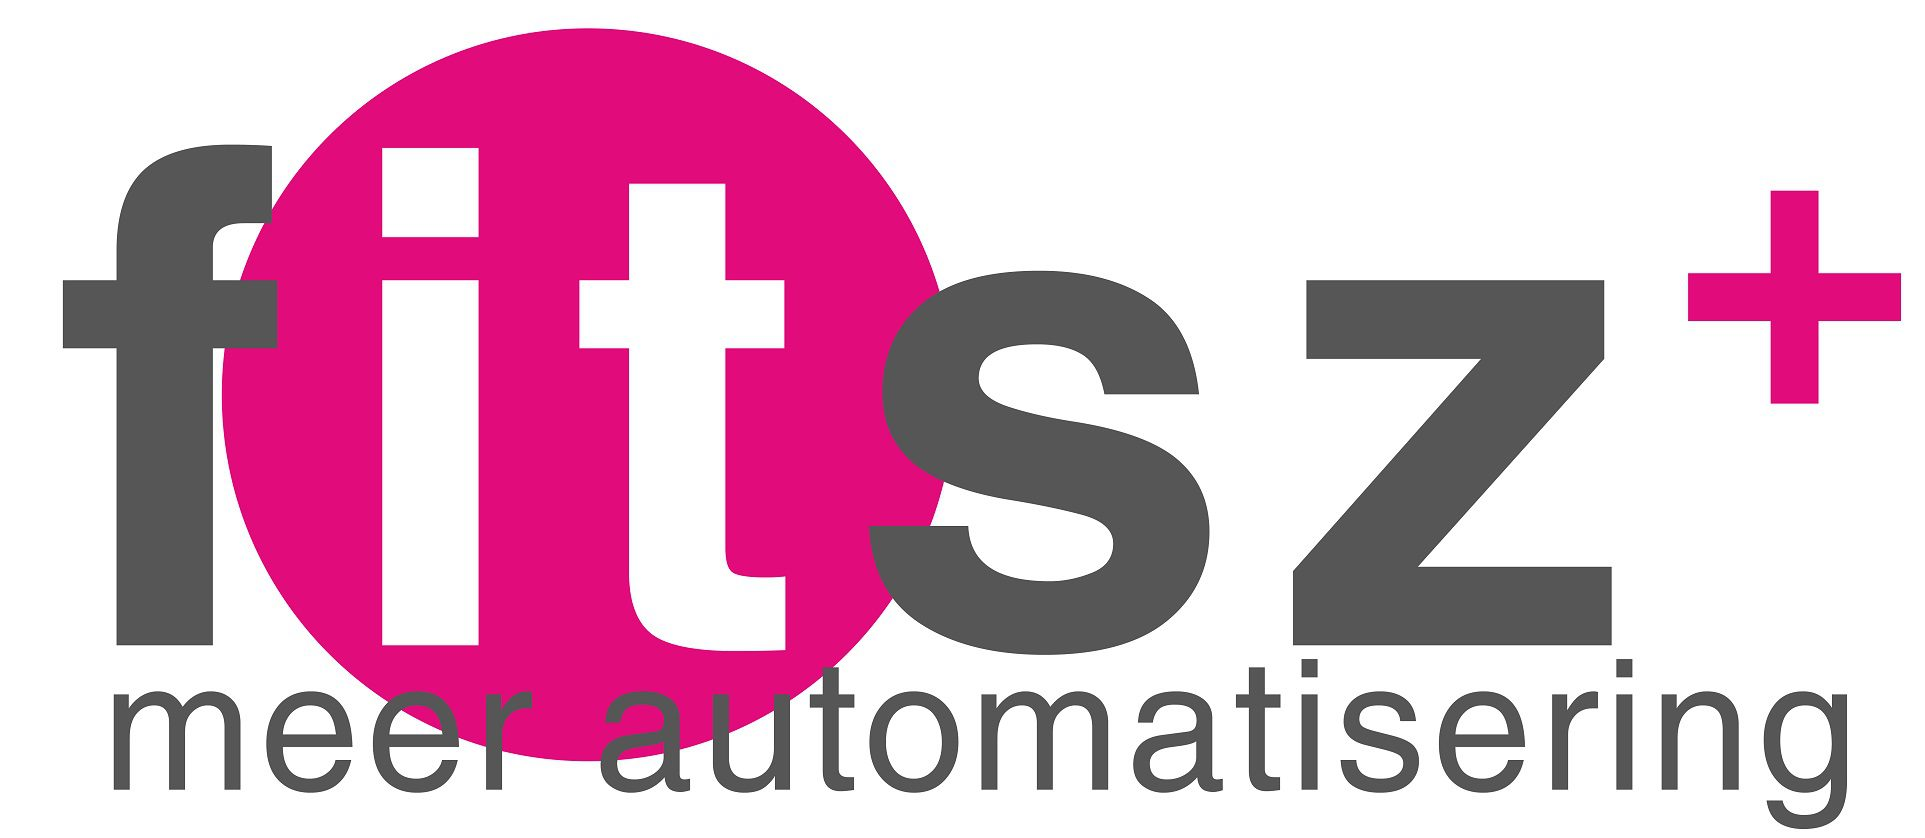 Fitsz meer Automatisering